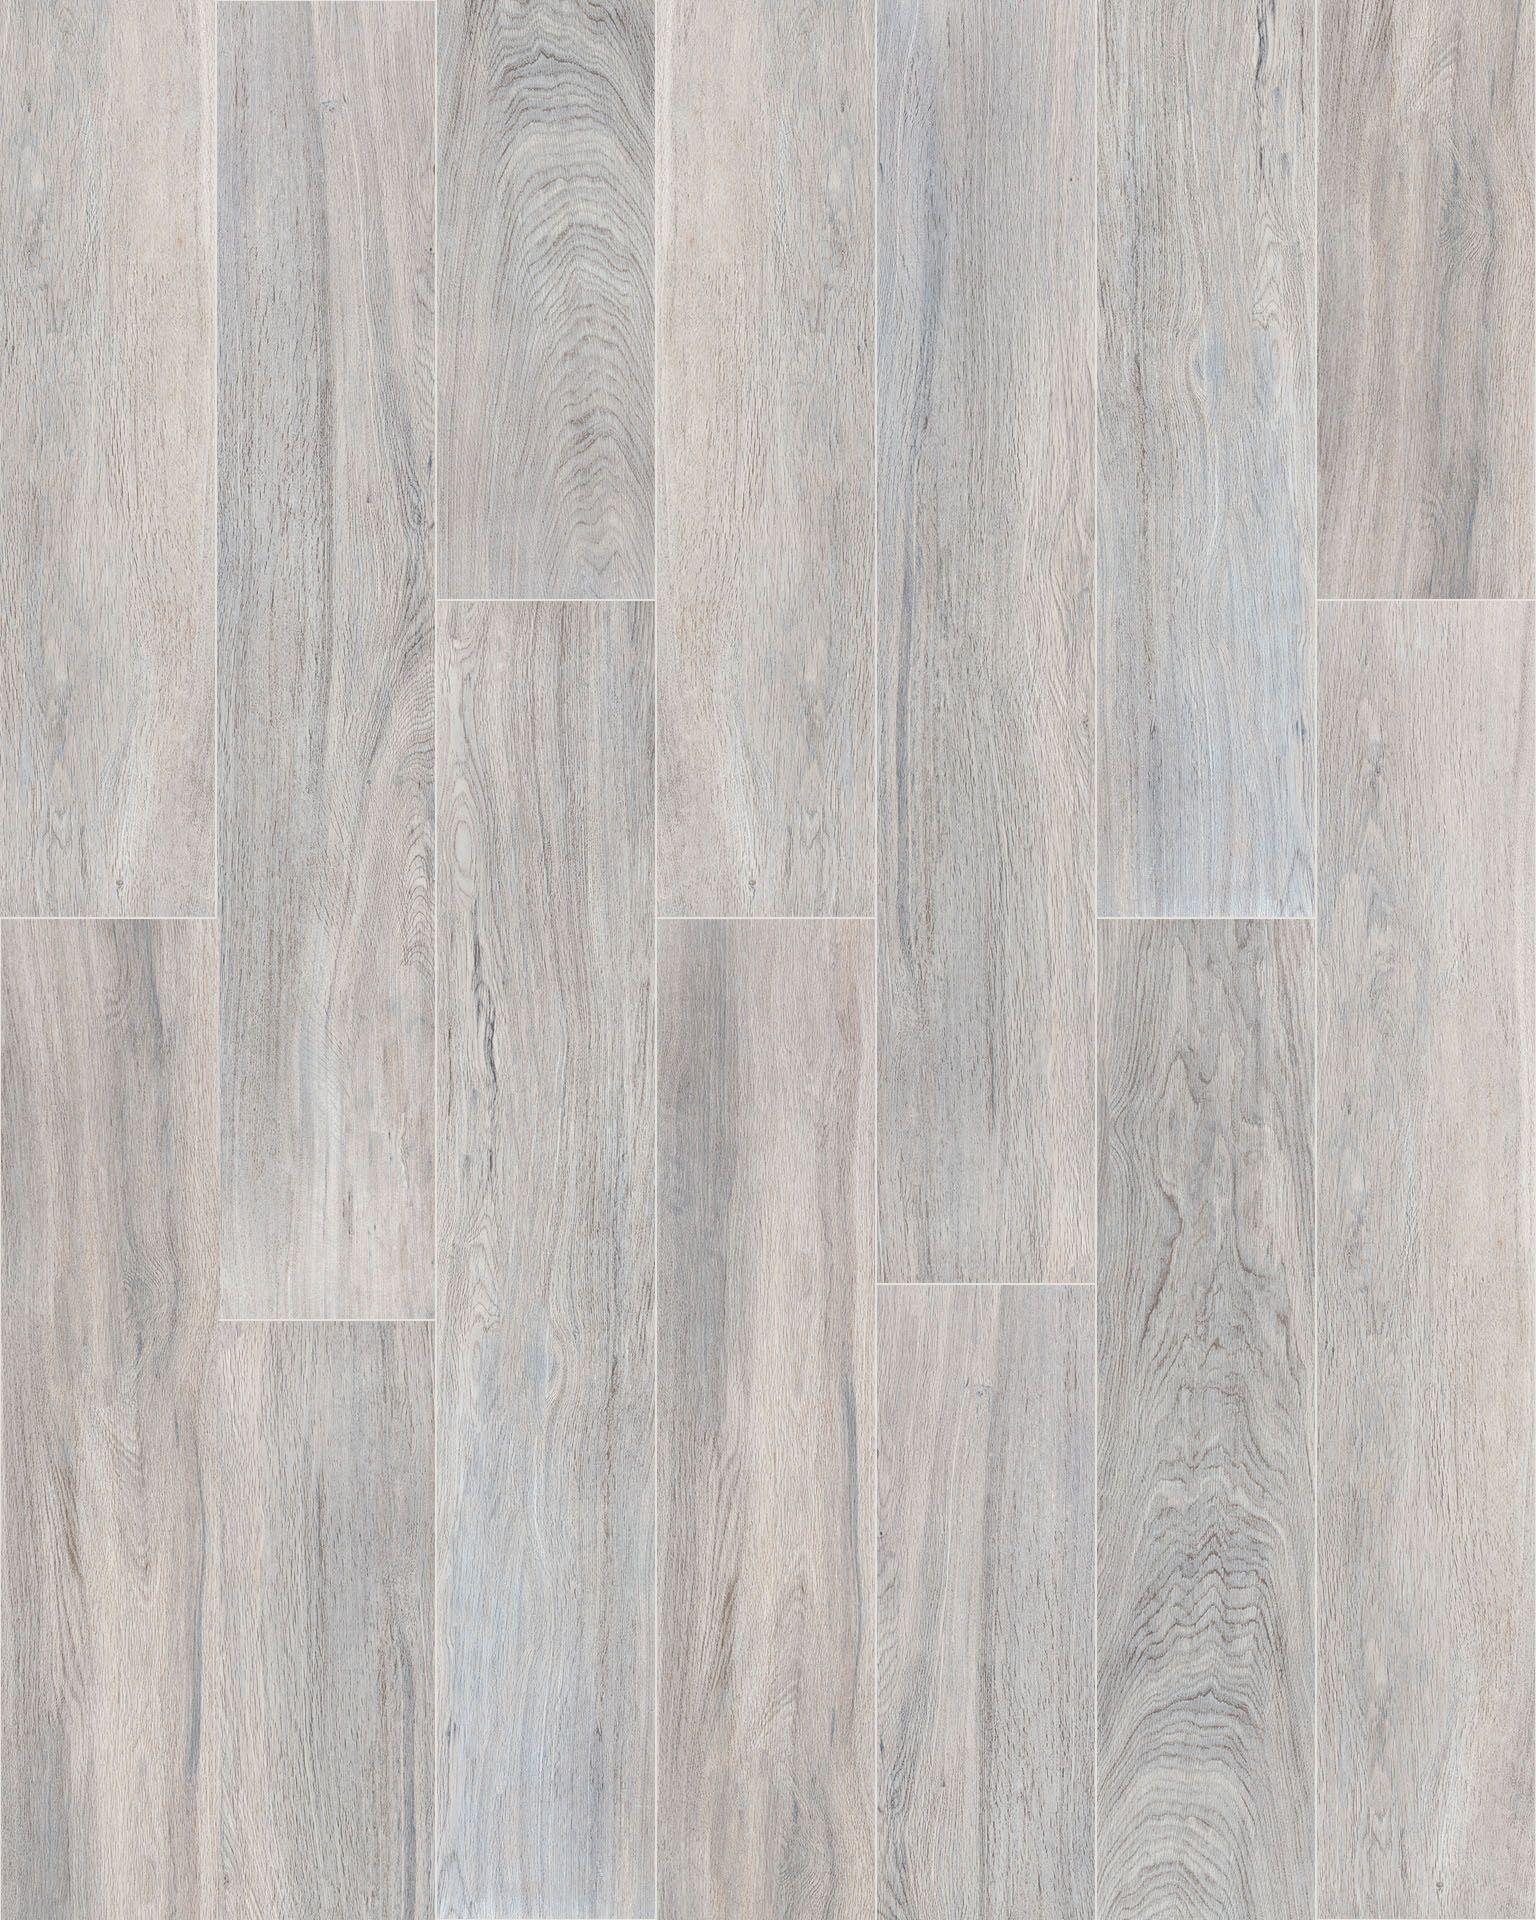 Guayacan Gris 8 X 48 Porcelain Wood Look Tile Flooring